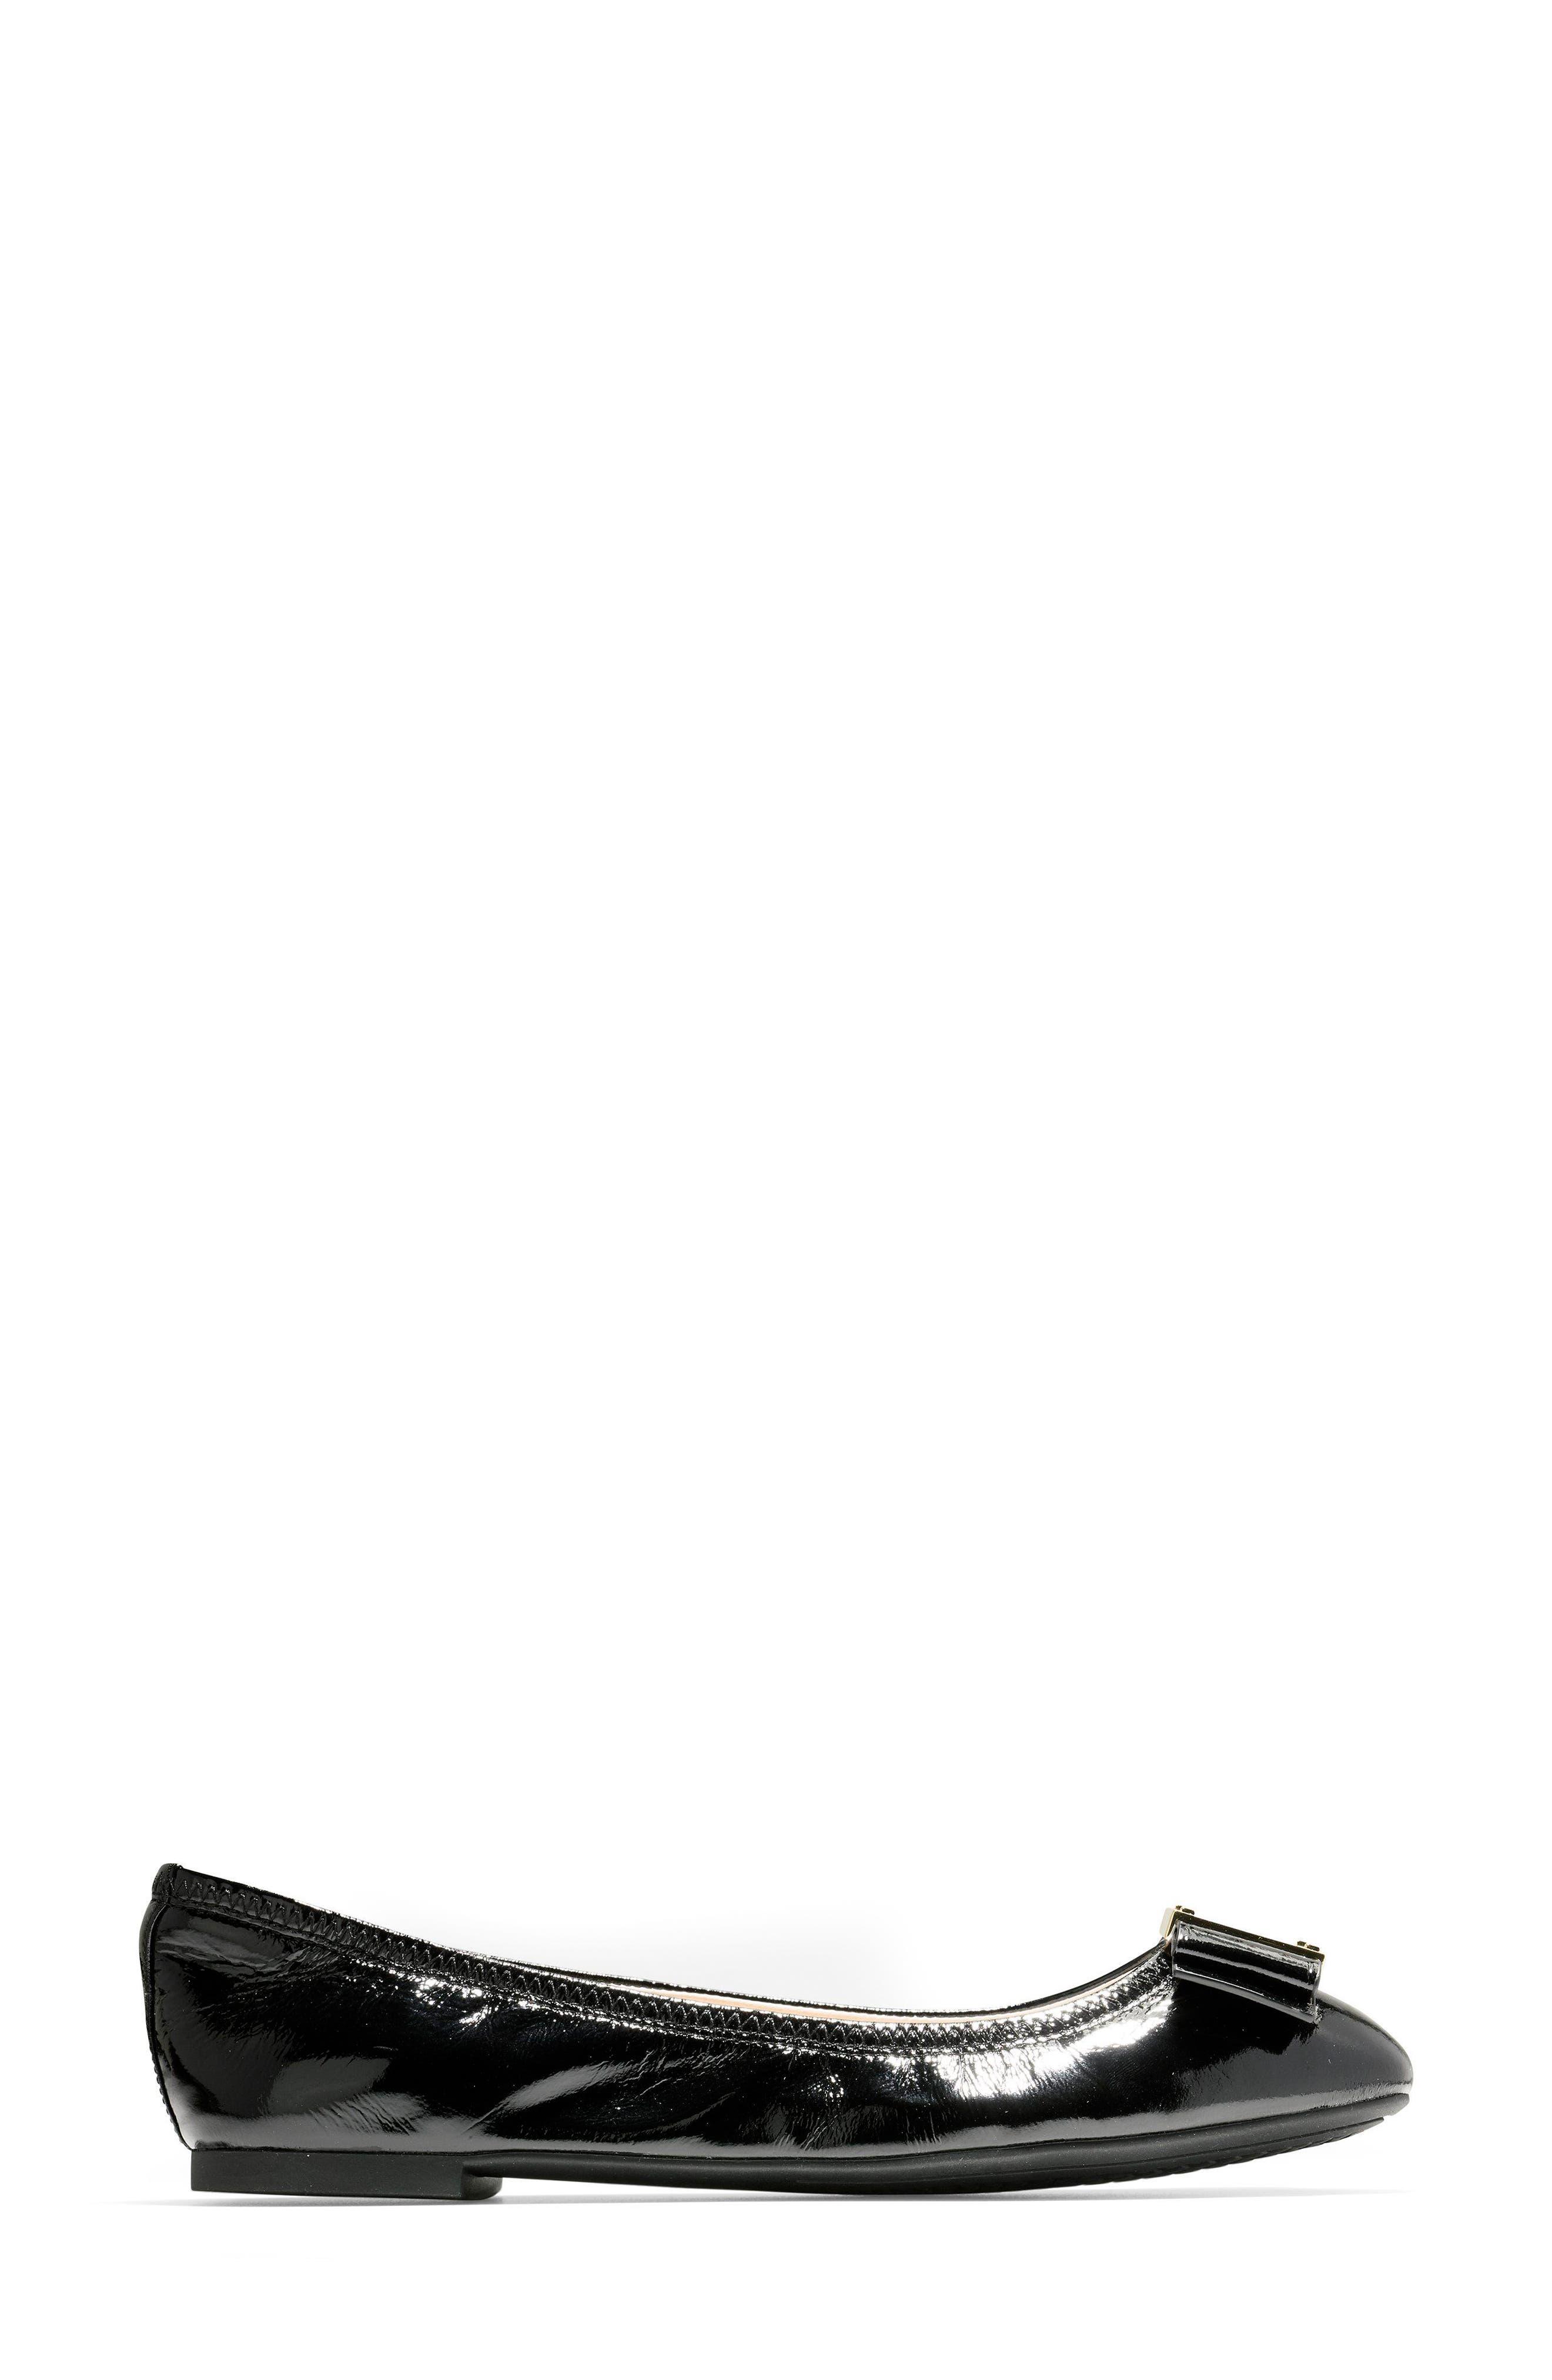 Tali Modern Bow Ballet Flat,                             Alternate thumbnail 3, color,                             Black Patent